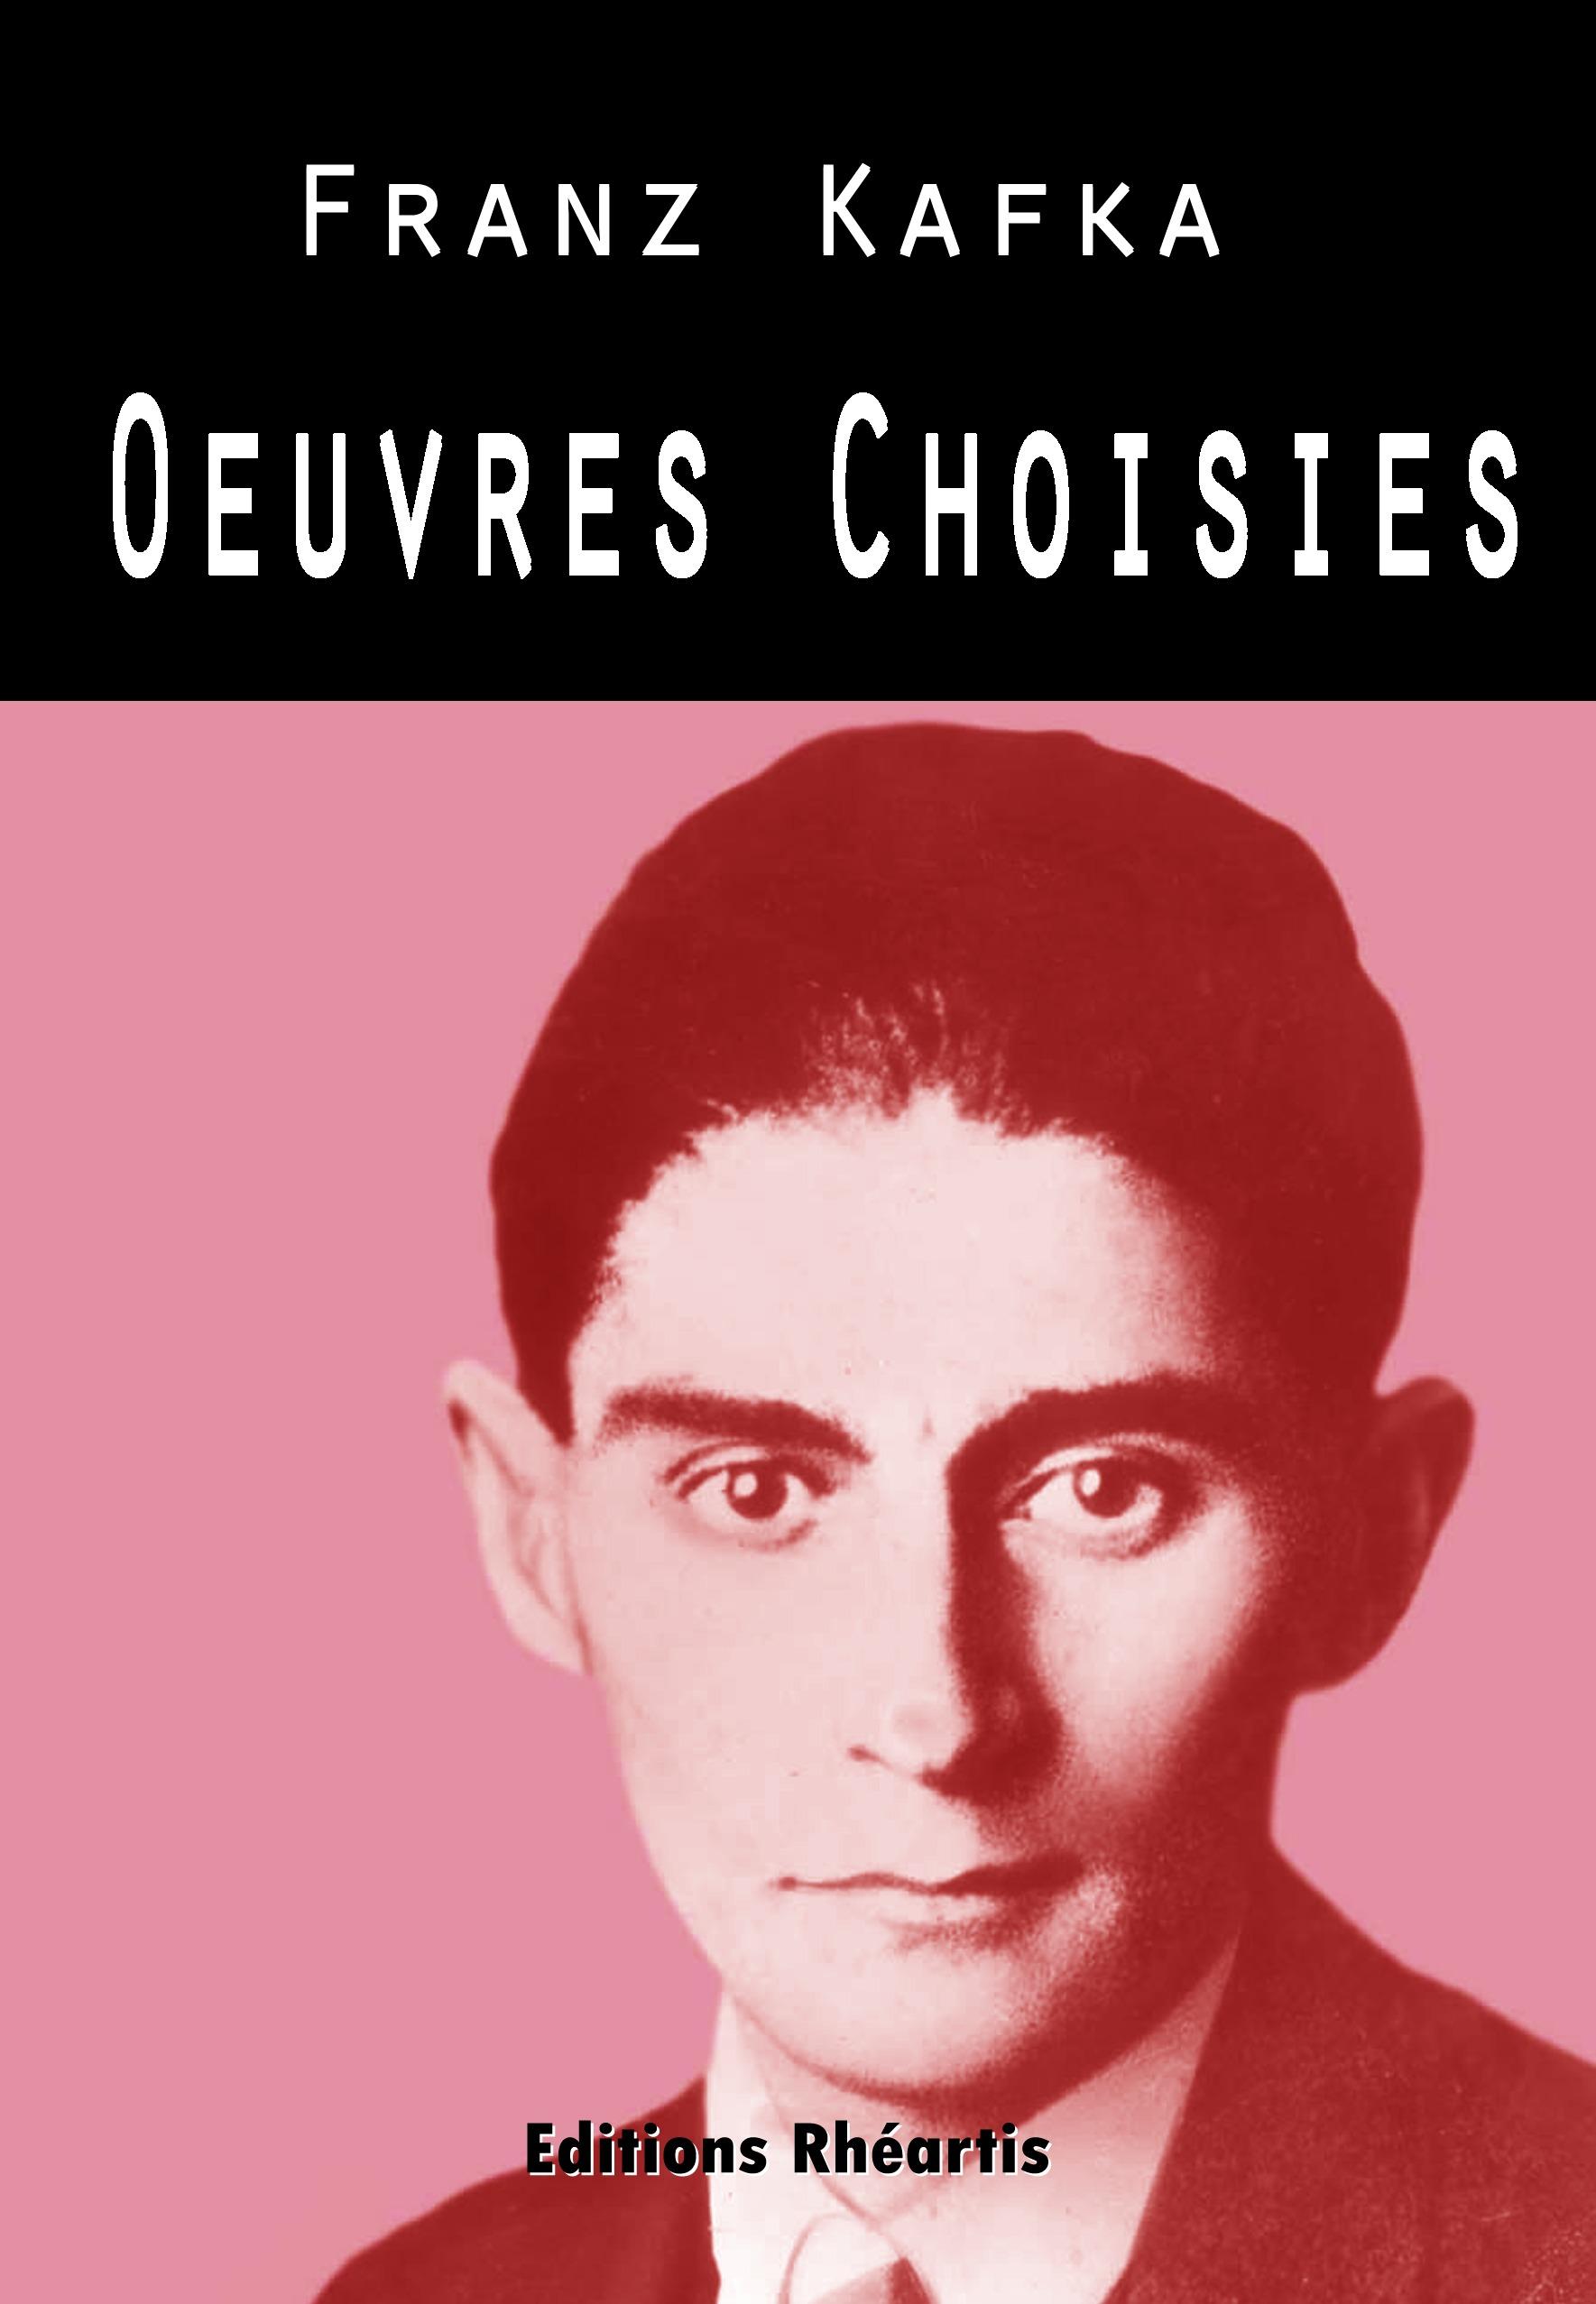 Kafka - Oeuvres Choisies